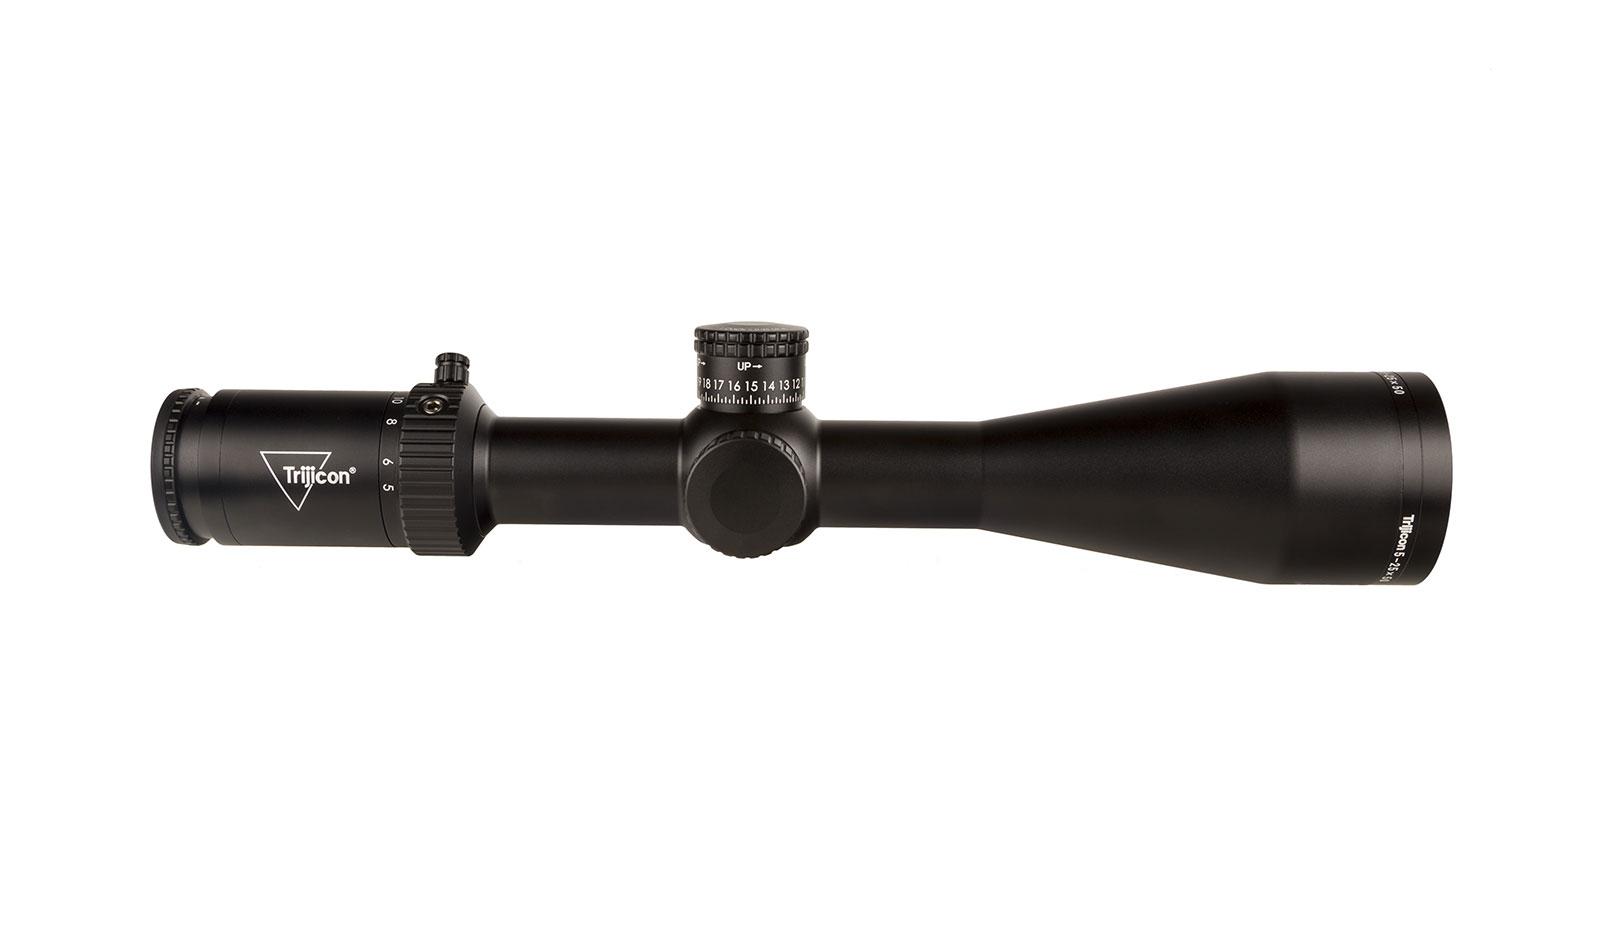 TMHX2550-C-3000010 angle 6